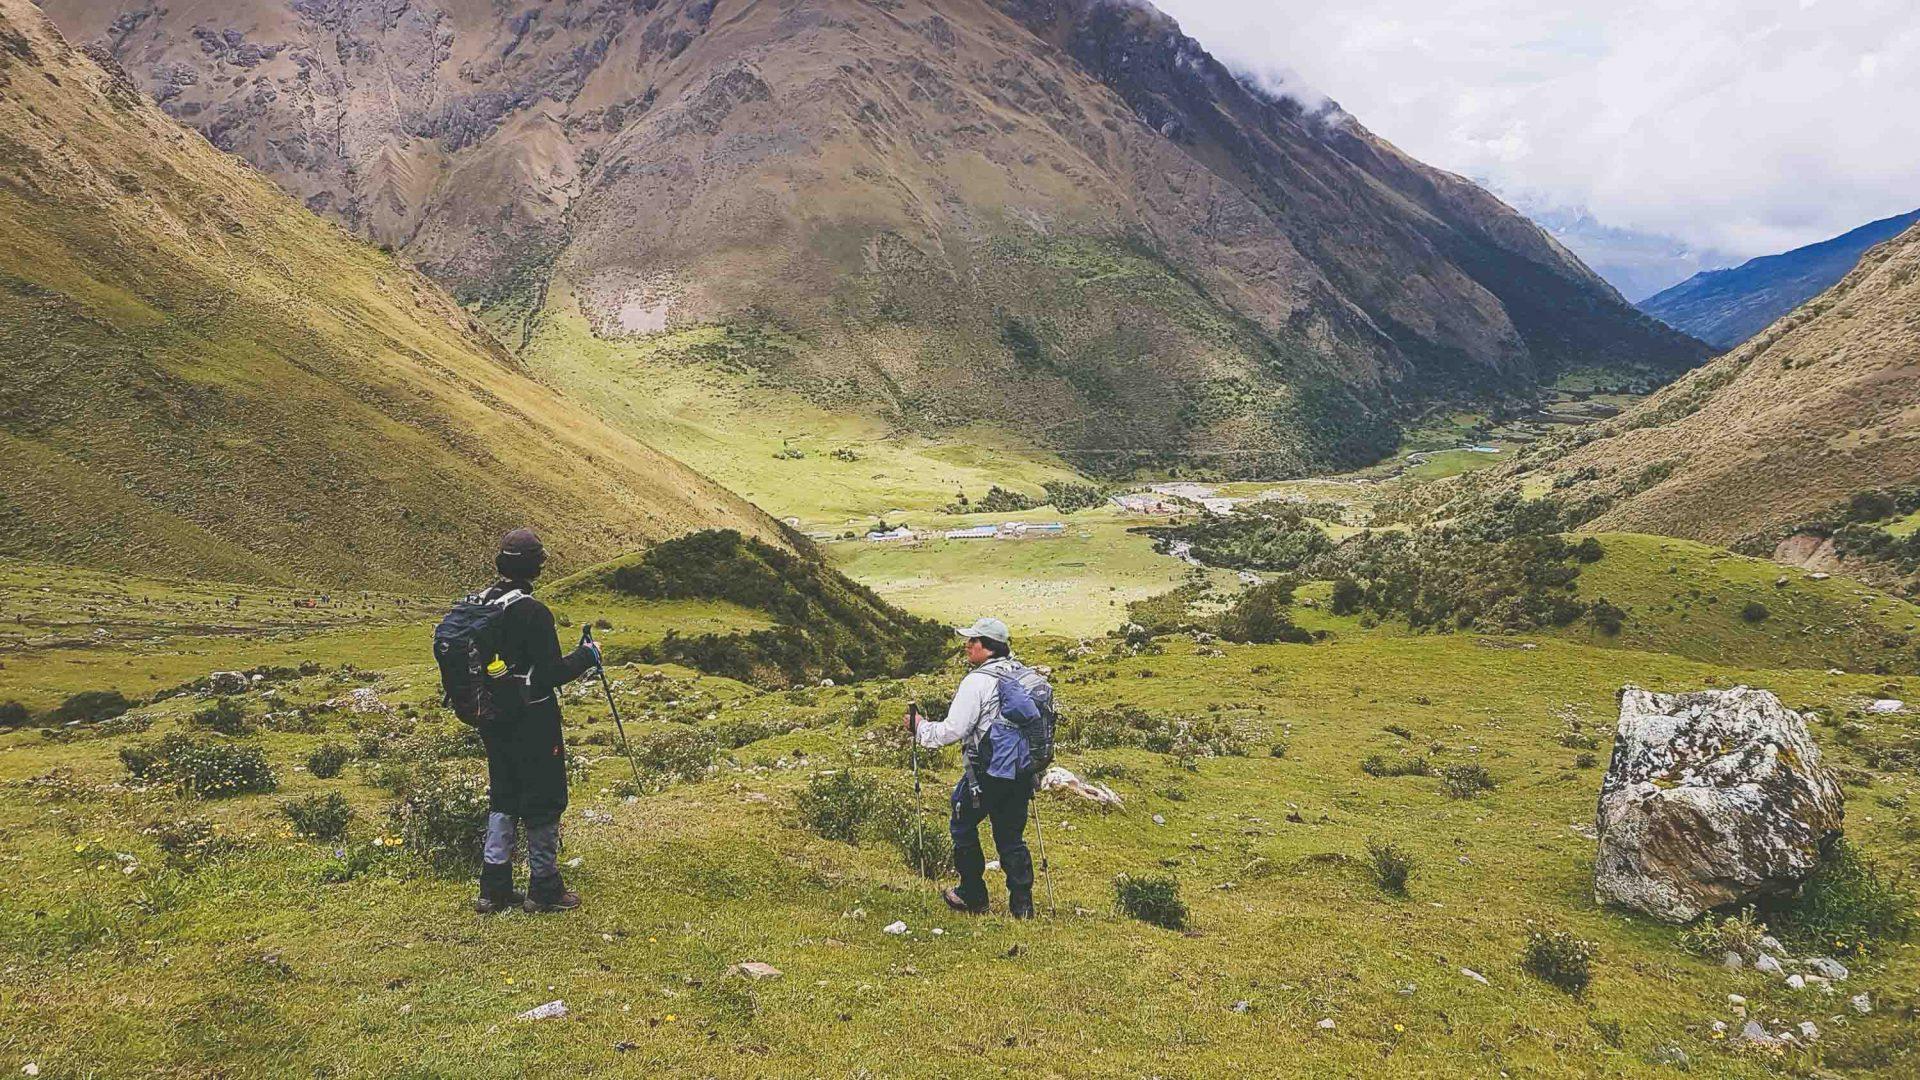 Hikers on the Salkantay trail in Peru.